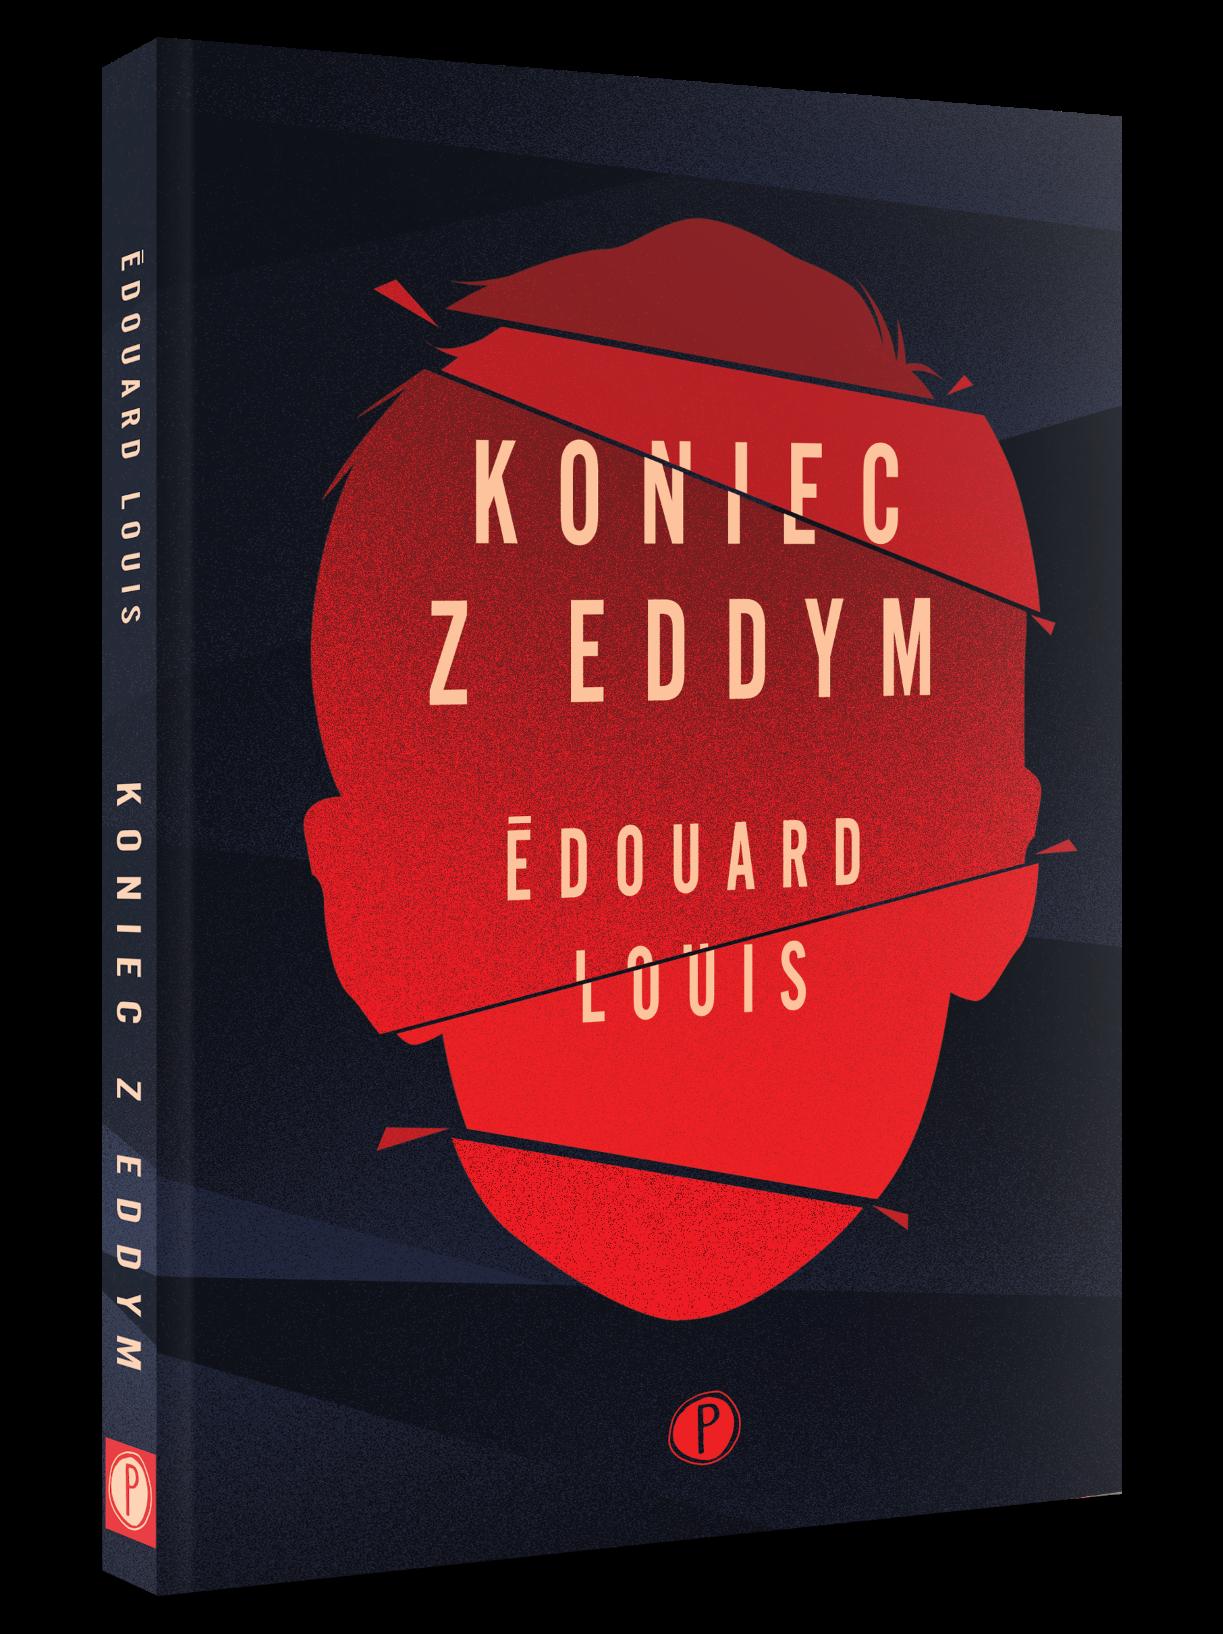 LouisKoniecZeddym_3D_beztla small